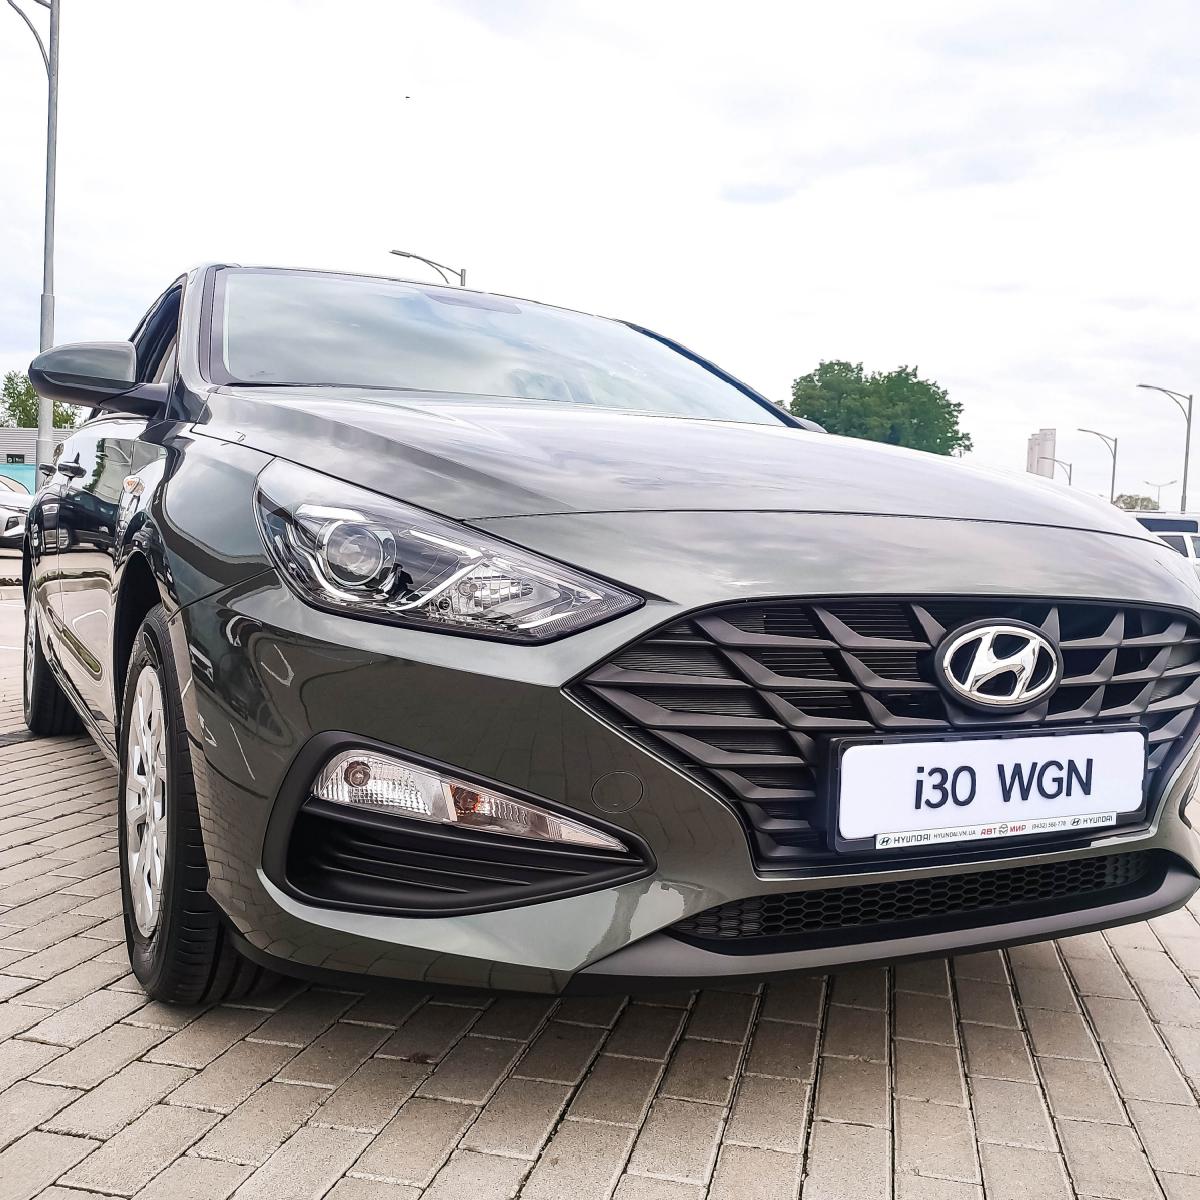 Спеціальна вигода на придбання Hyundai i30 WGN!   Хюндай Мотор Україна - фото 7